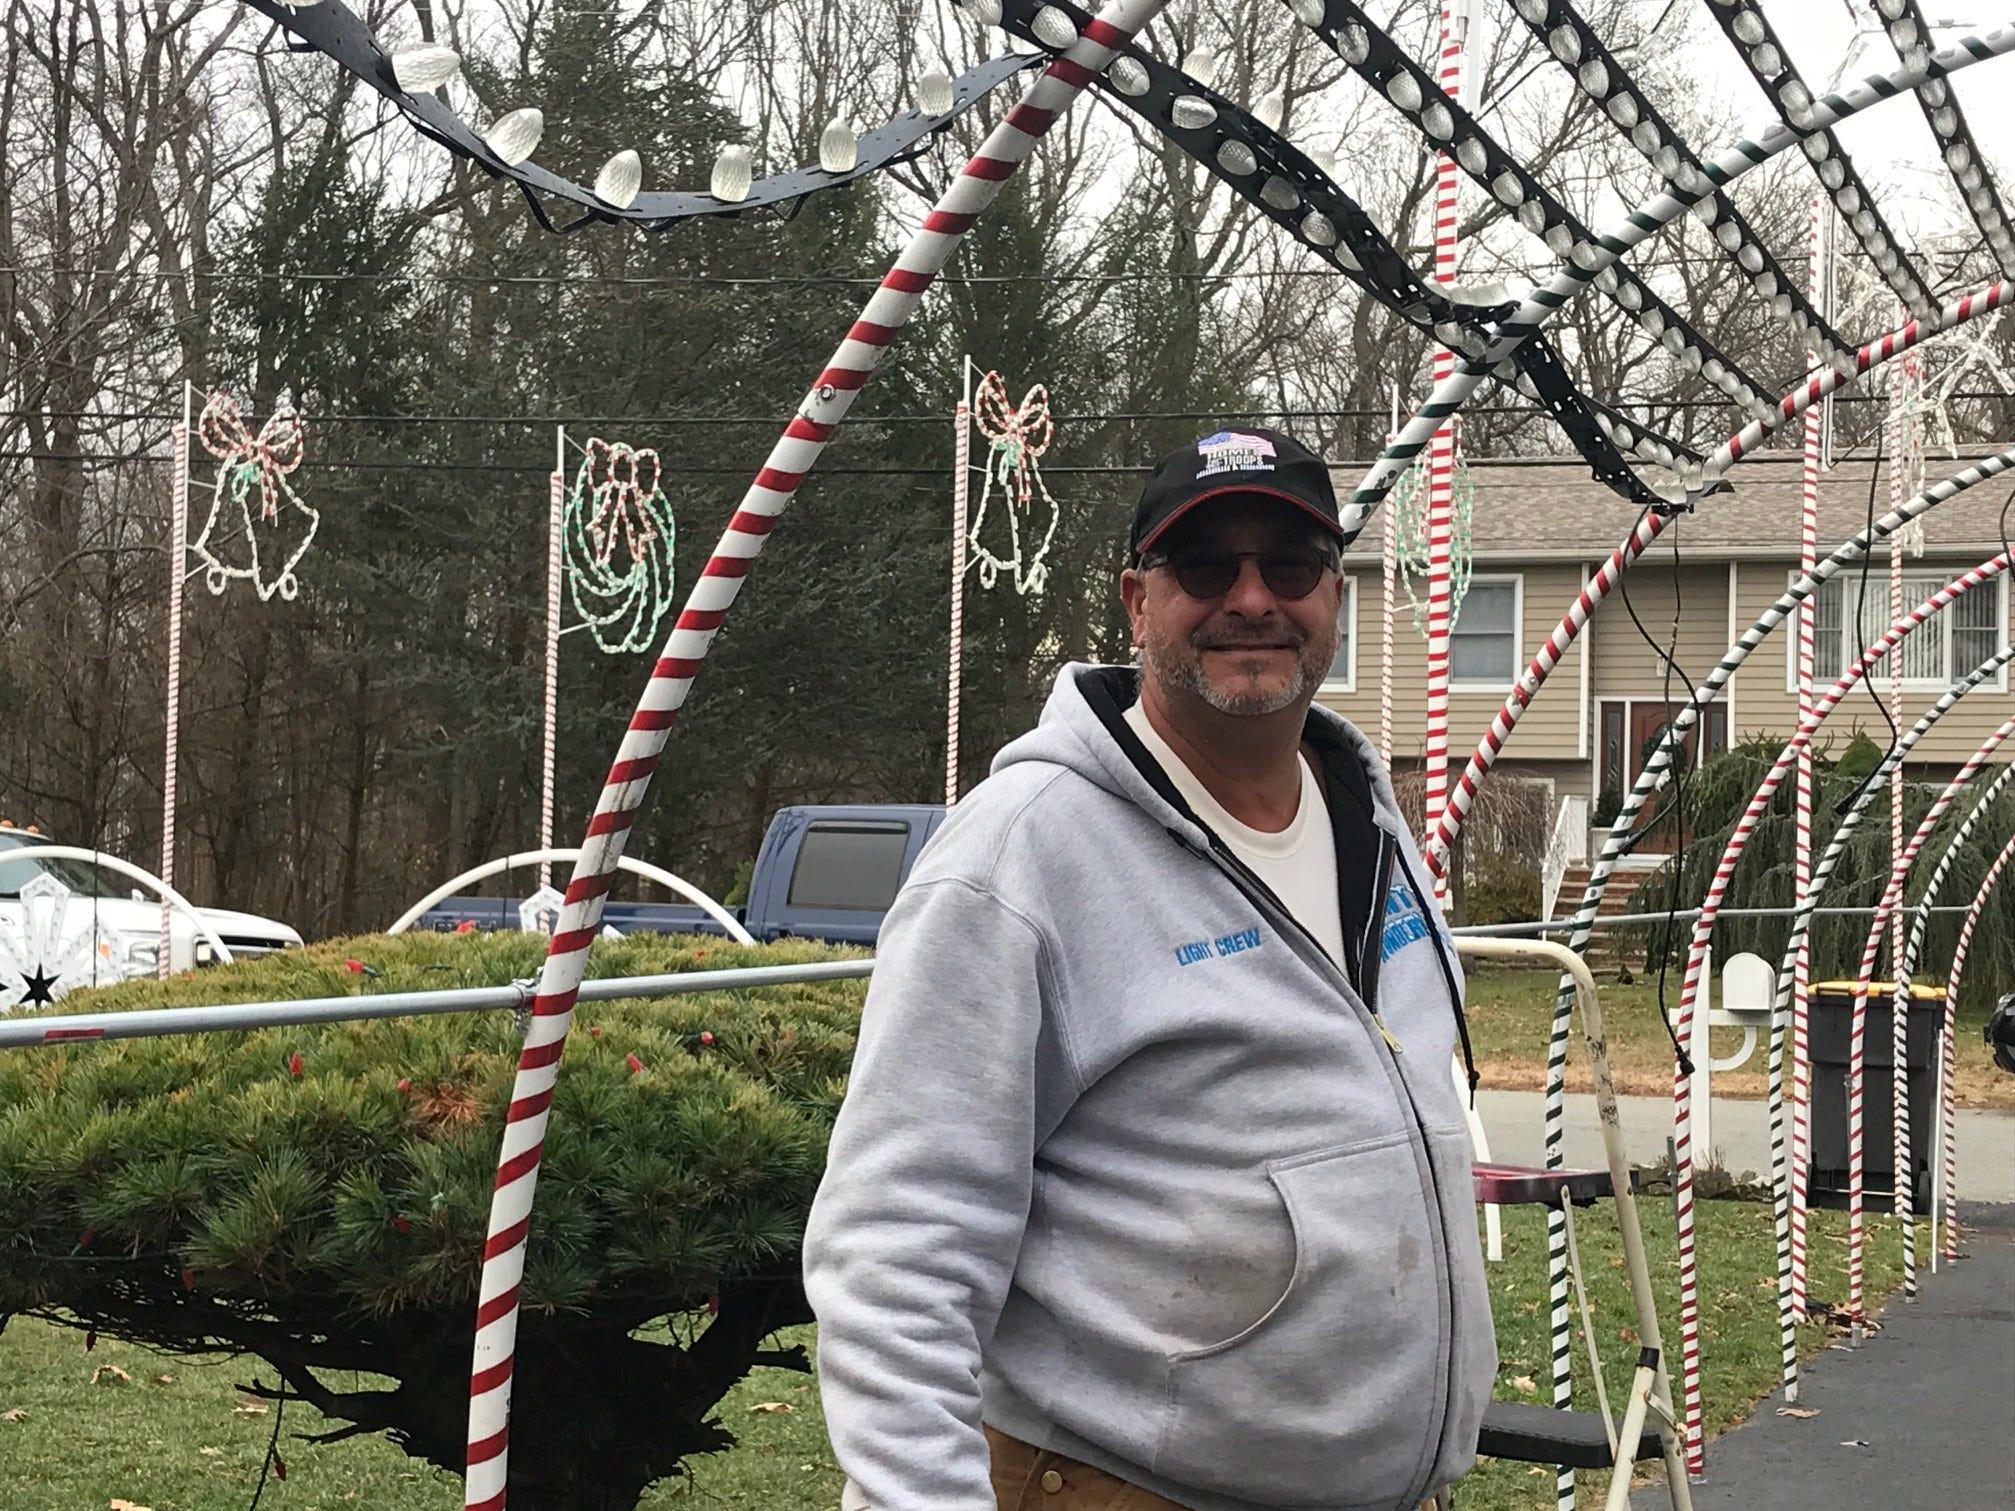 Thomas Apruzzi of Old Bridge readies his holiday lights show for the season.